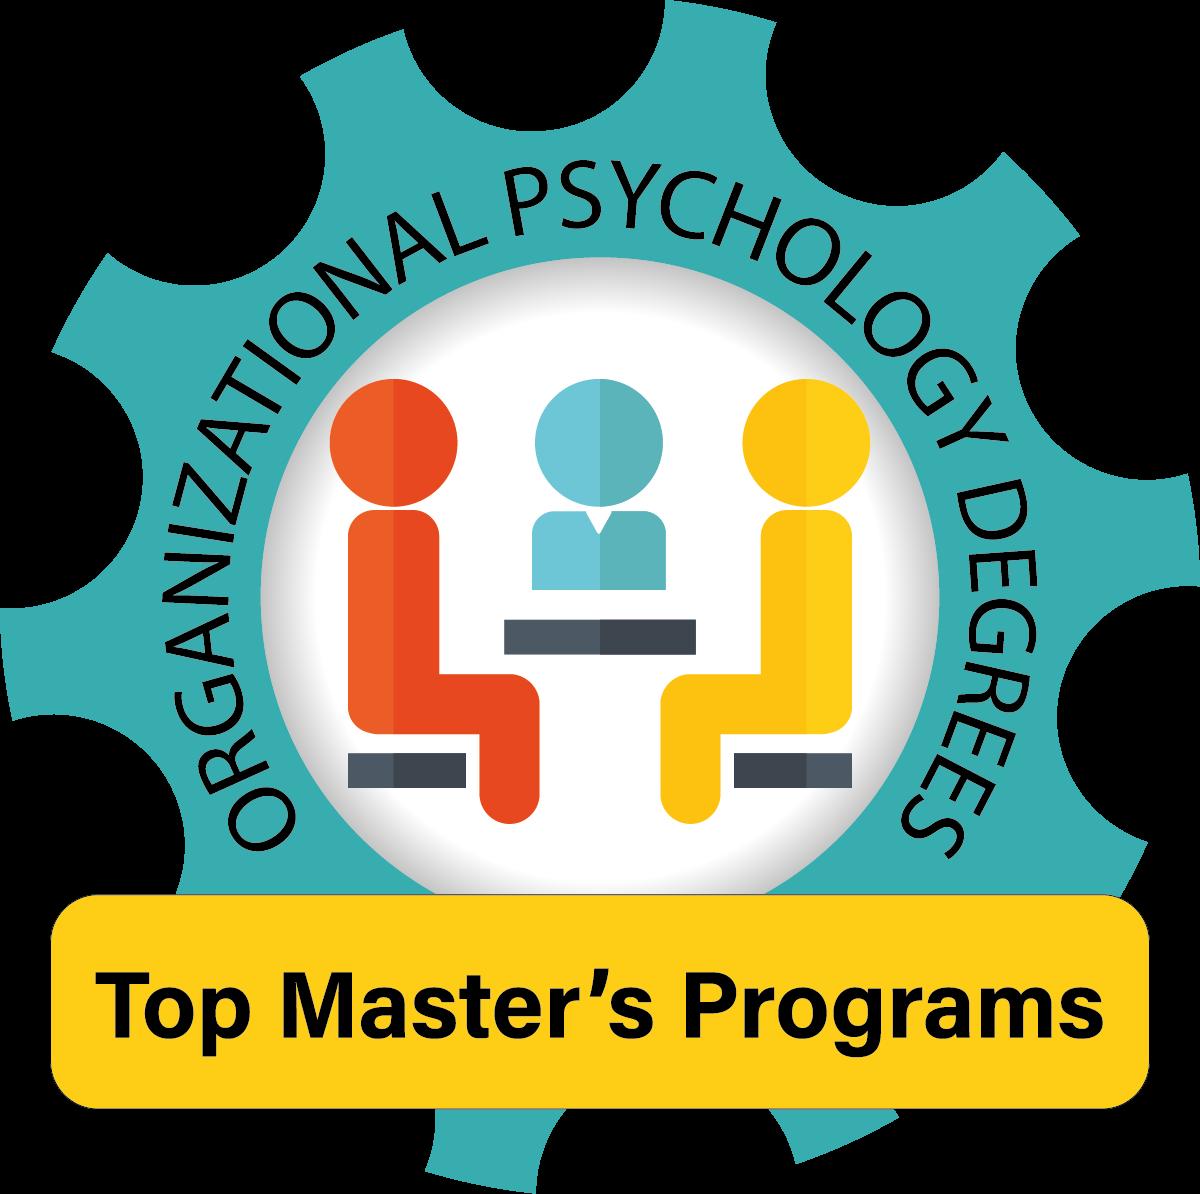 top-masters-programs_1 - Organizational Psychology Degrees